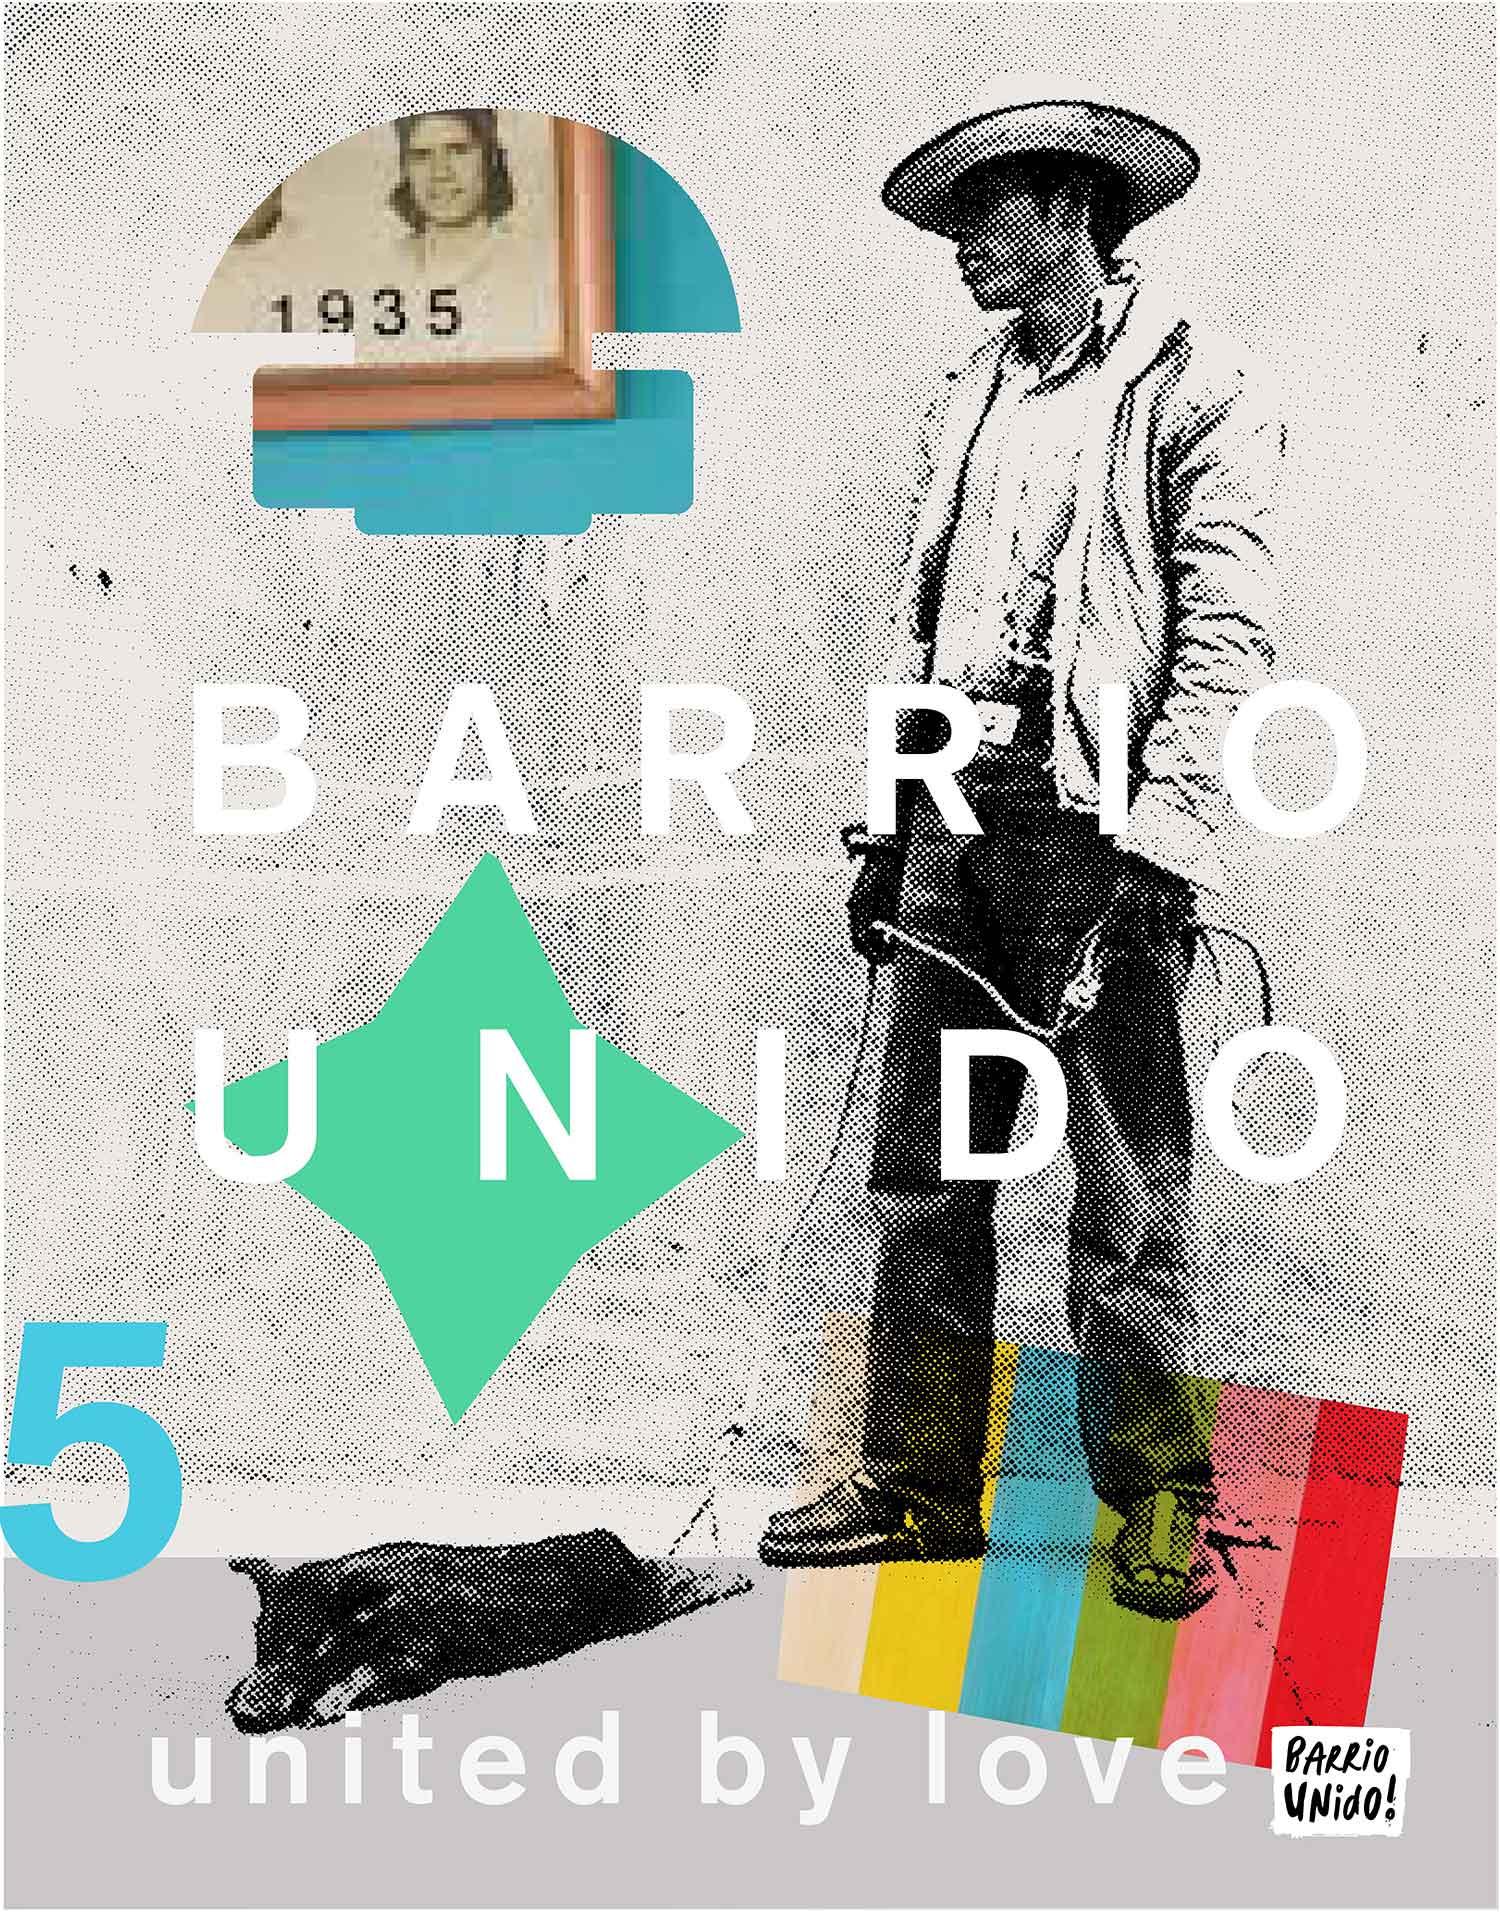 ron-miriello-grafico-barrio-logan-posters-san-diego-community-design-Miriello-branding-officina-03jpg